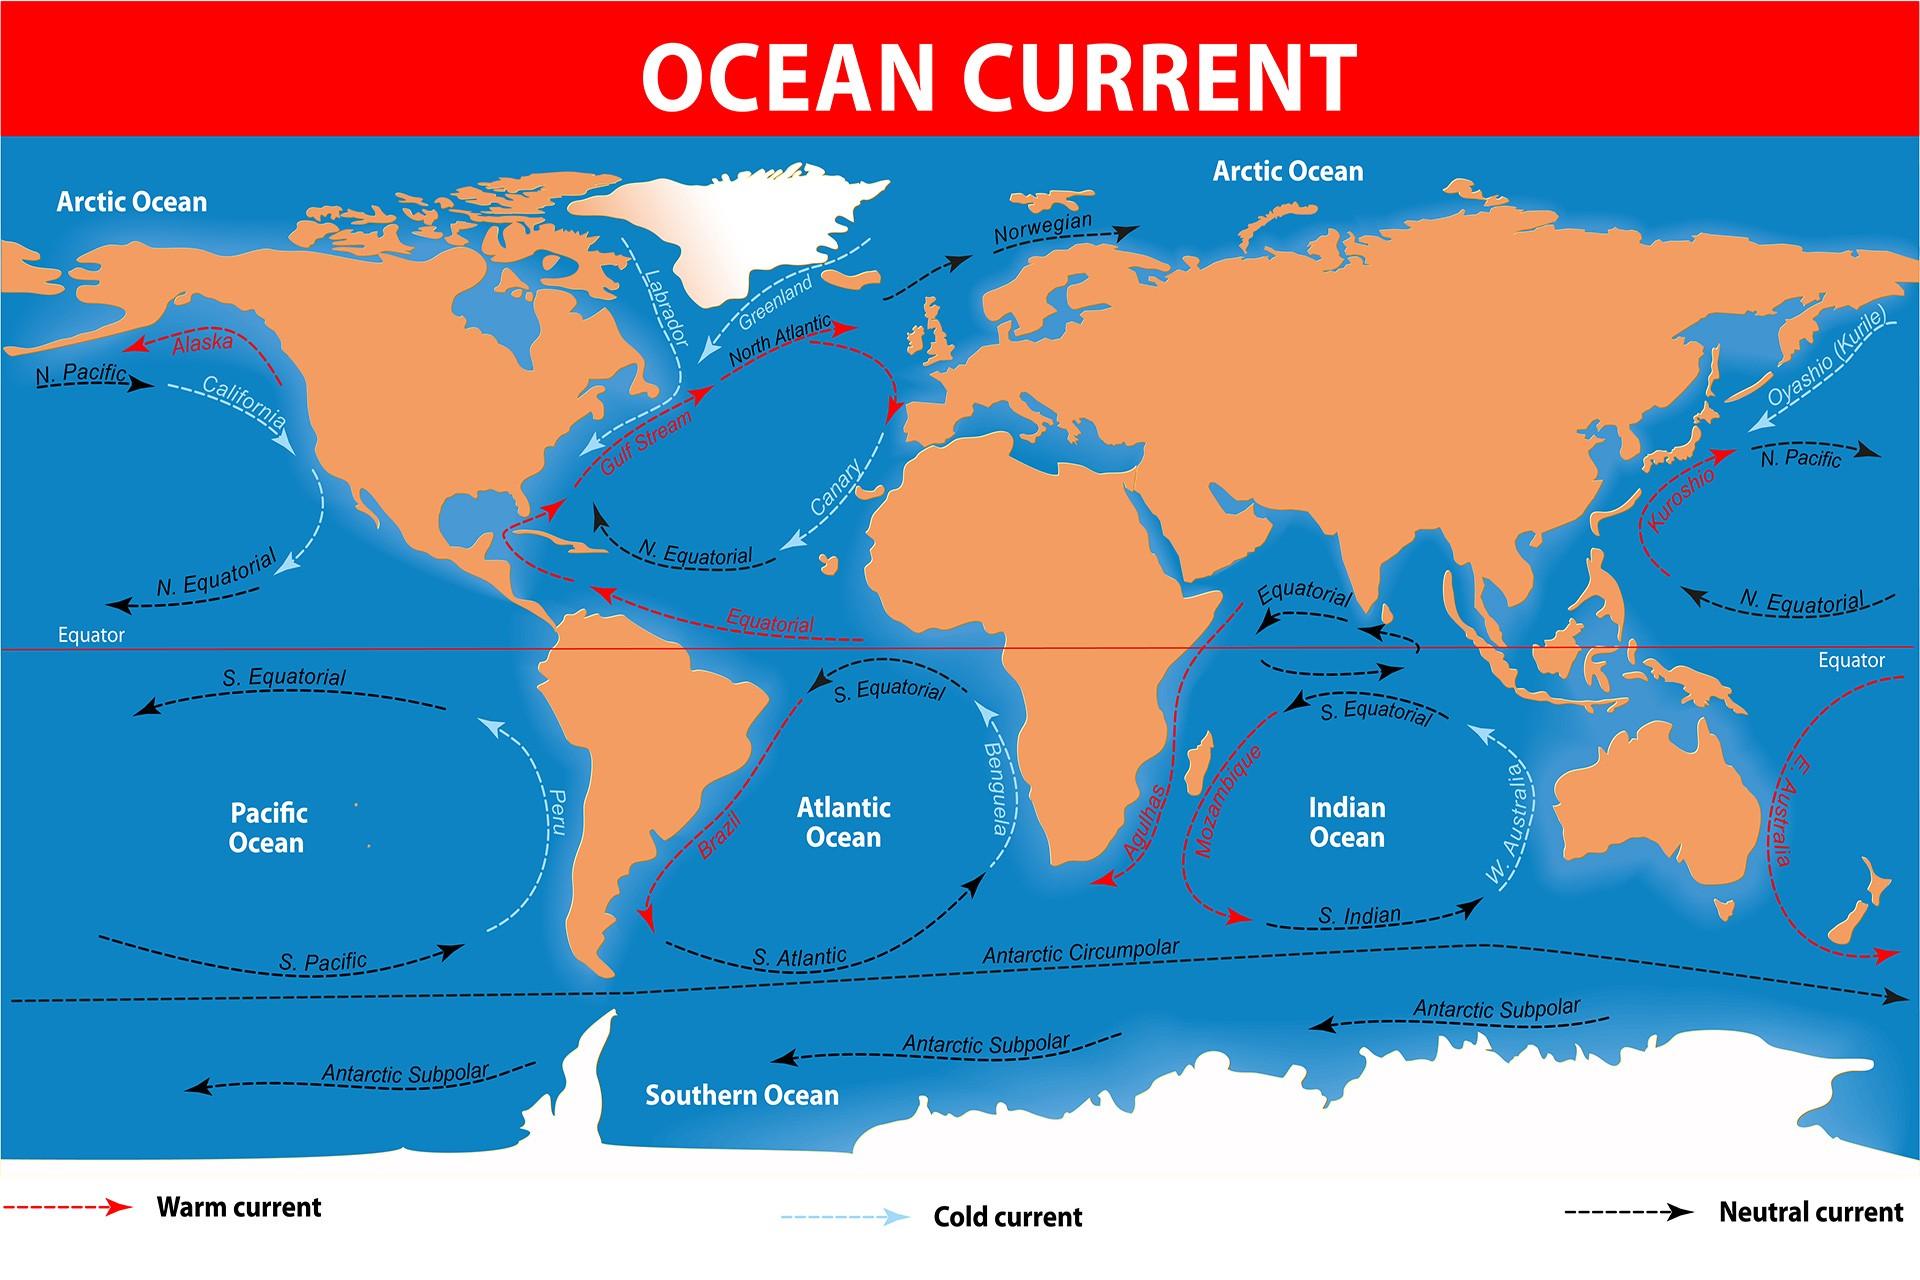 Wallpaper 1920x1280 Px Continents Sea World Map 1920x1280